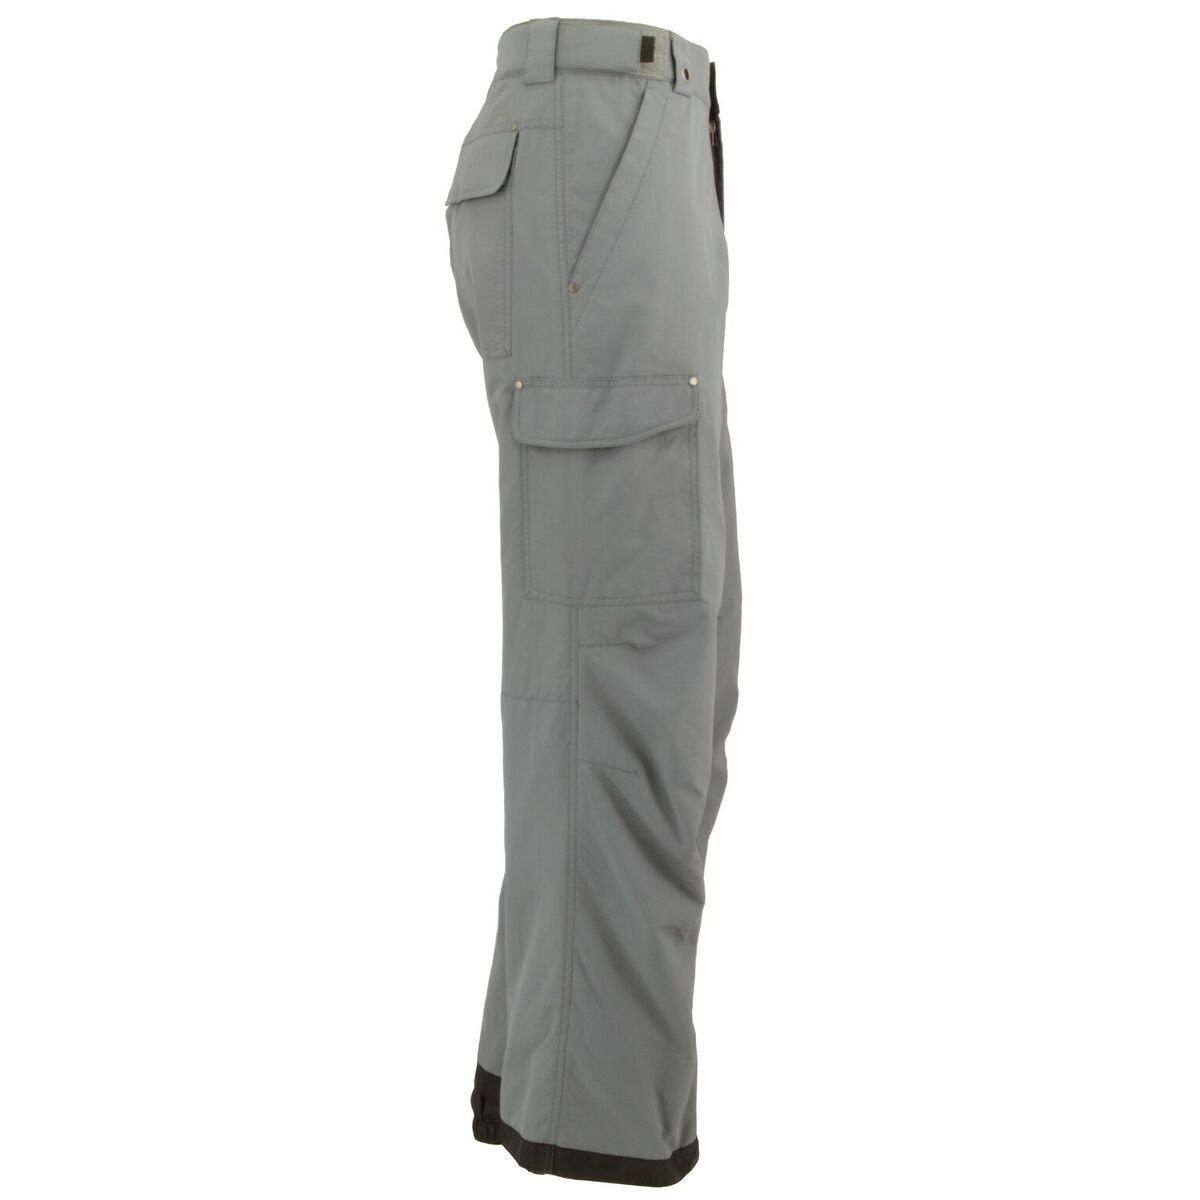 White Sierra Soquel Pant 30 Inseam